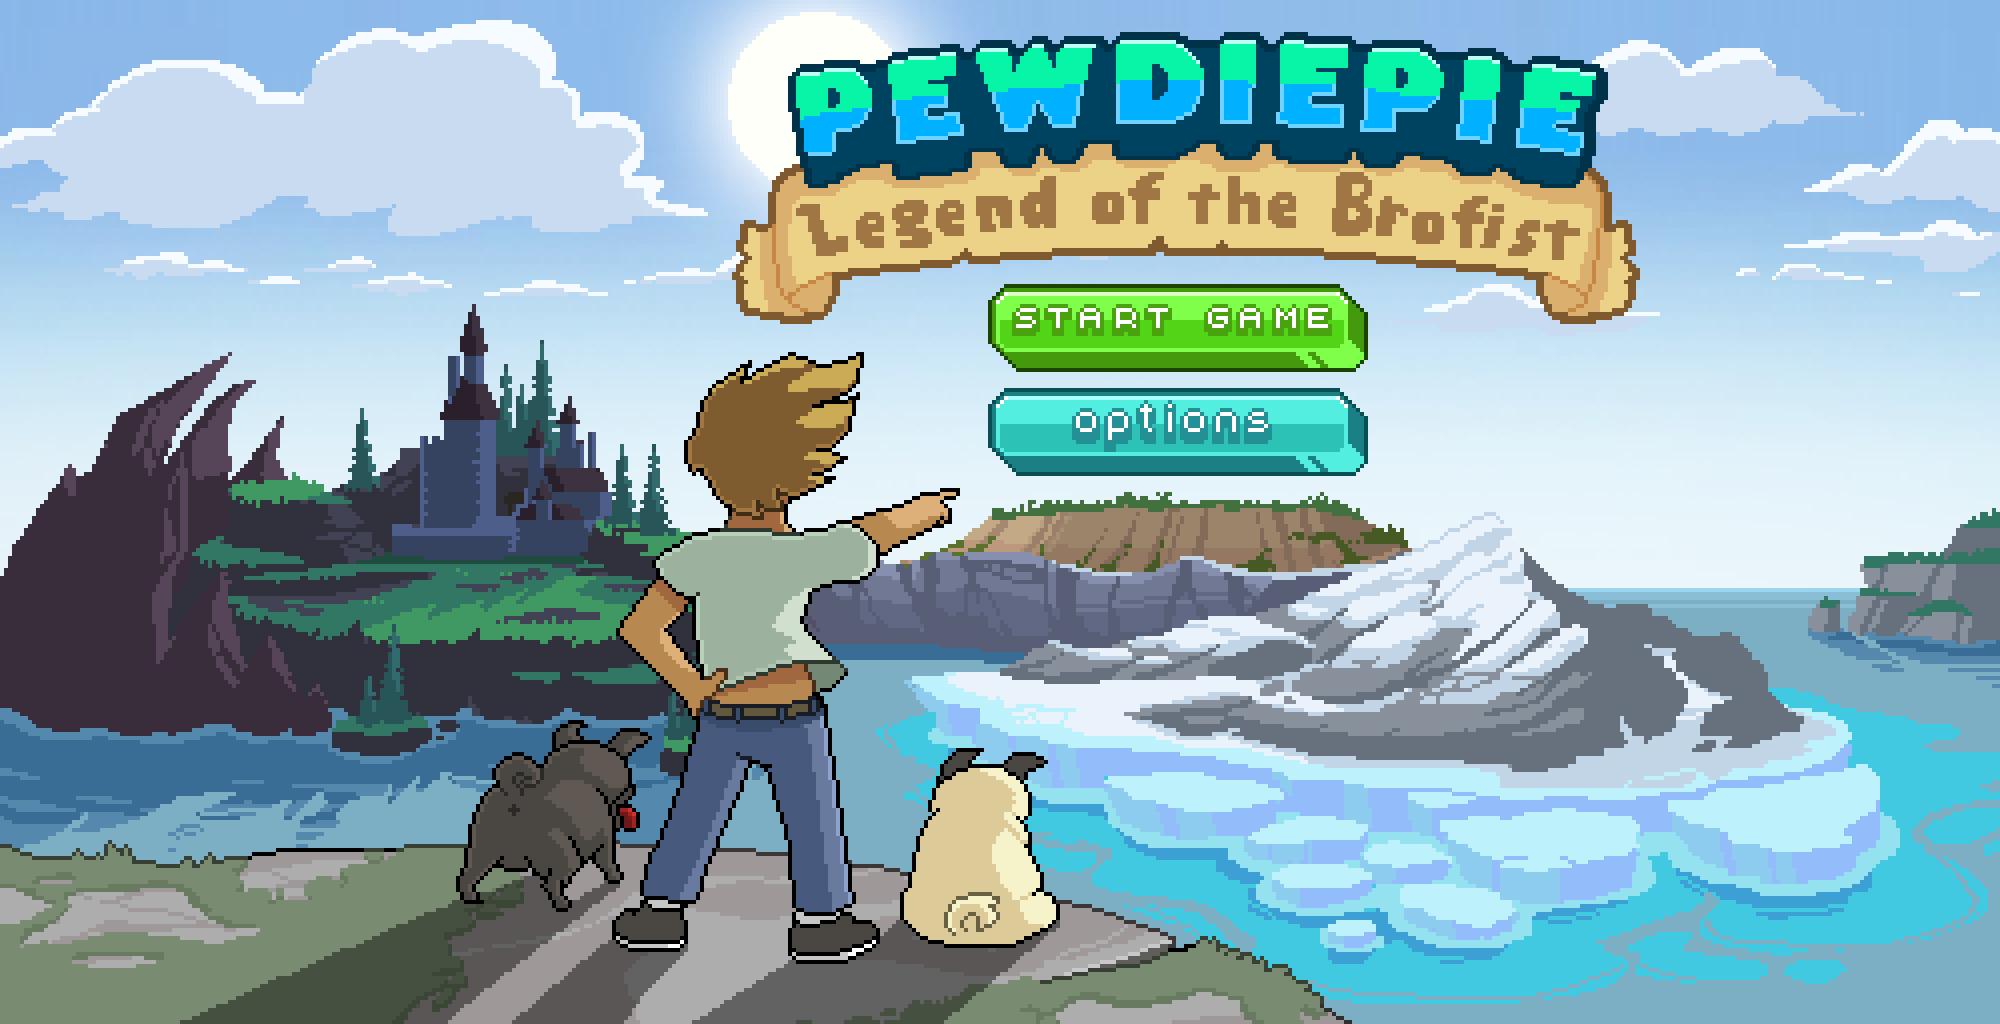 pewdiepie-game-screen.png